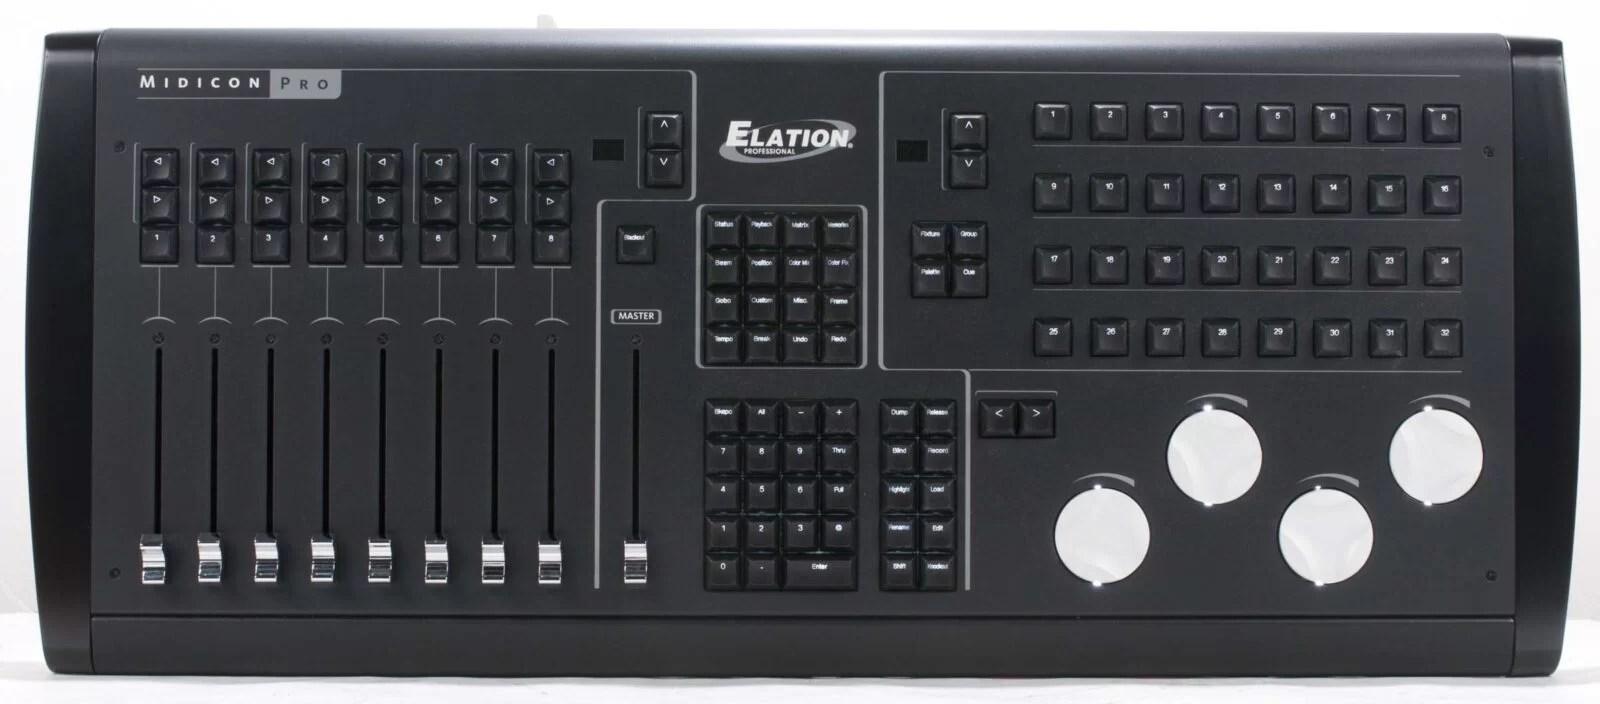 elation professional midicon pro midi usb lighting controller